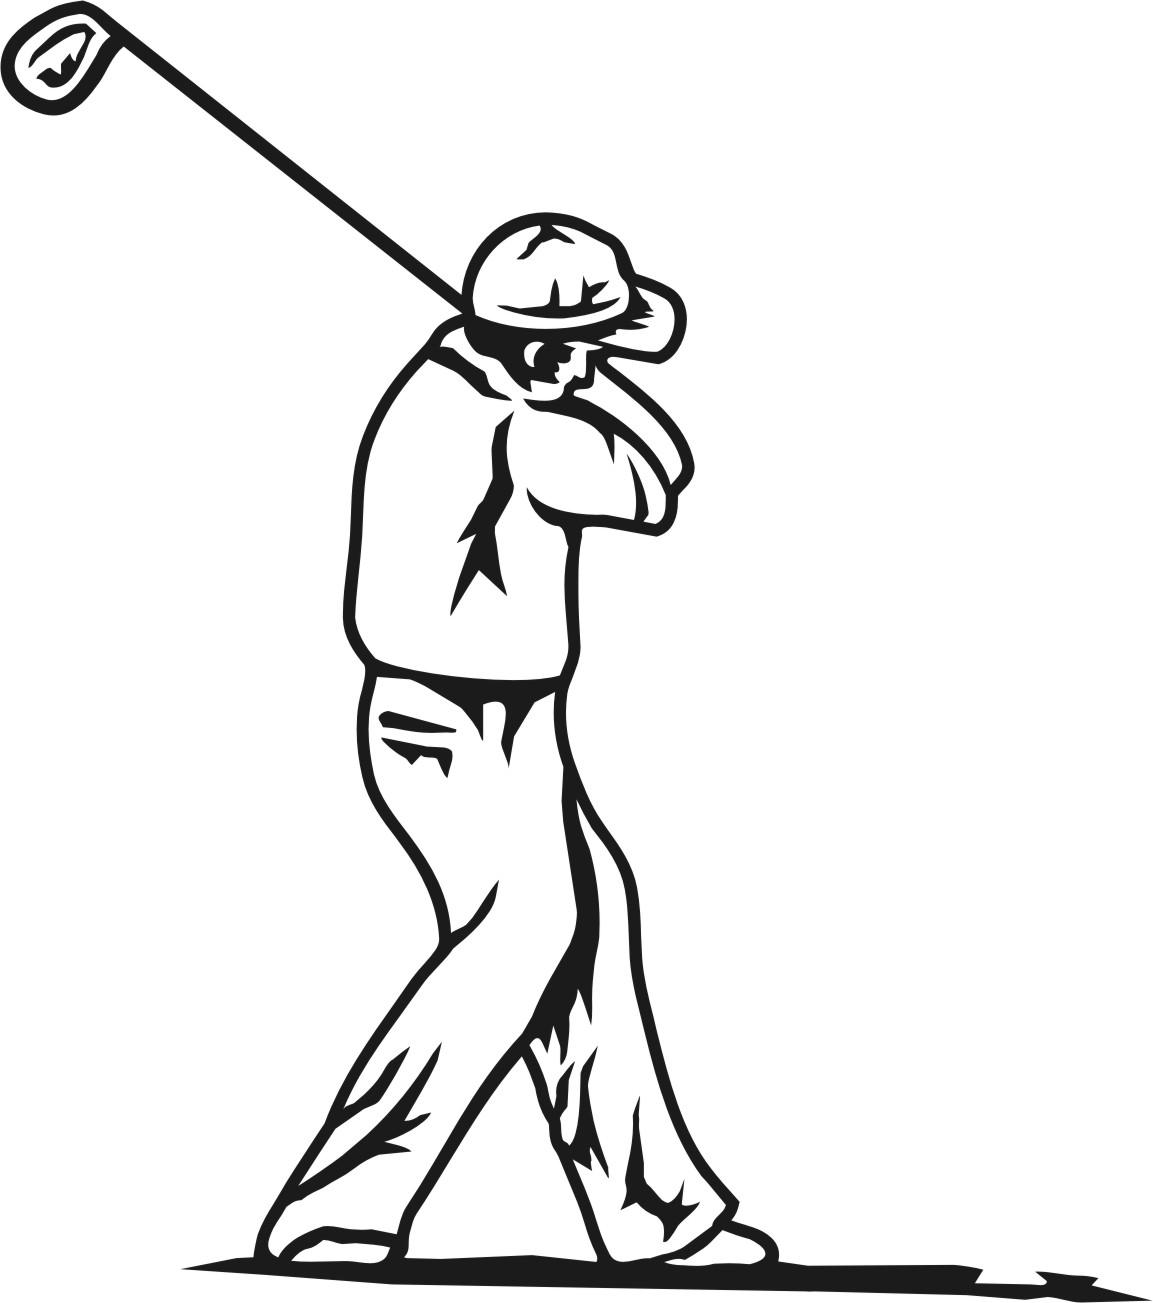 Golf Drawings